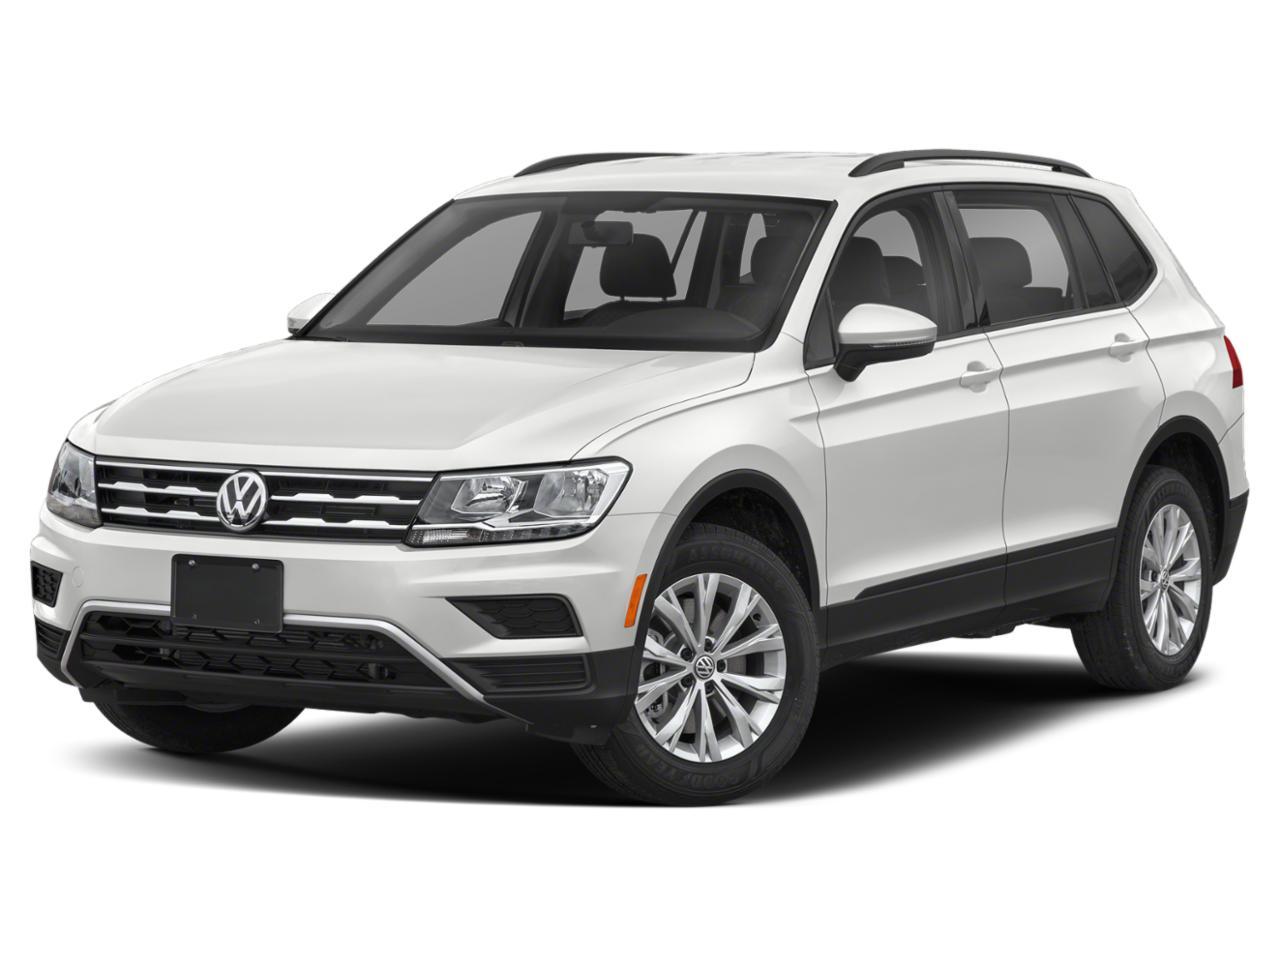 2020 Volkswagen Tiguan Vehicle Photo in Tucson, AZ 85712